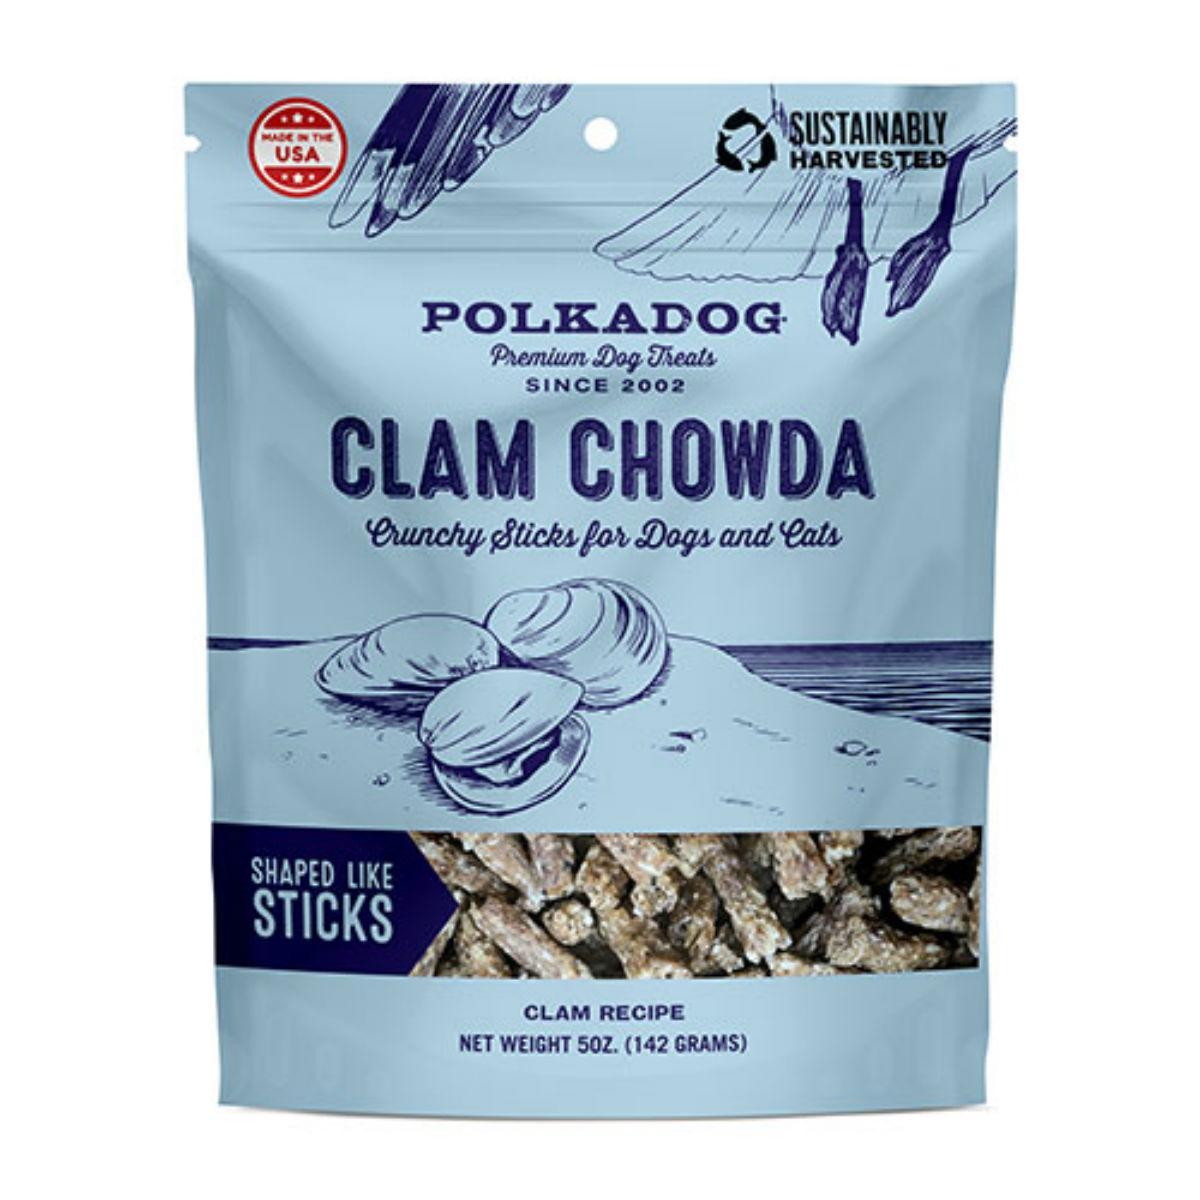 Clam Chowda Crunchy Sticks Pet Treats by Polka Dog